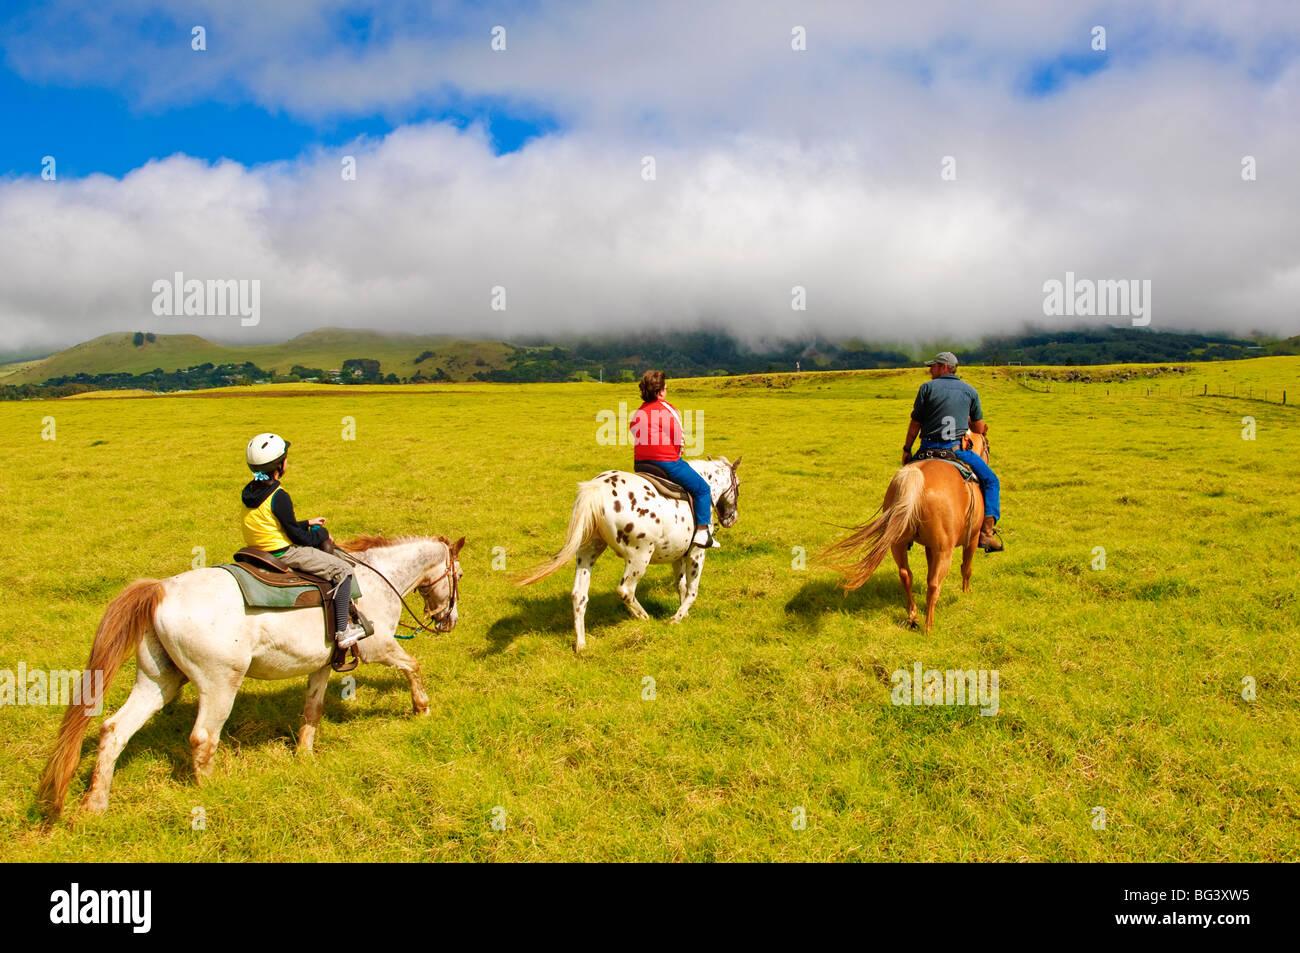 Horseback riding at Parker Ranch, The Big Island, Hawaii, United States of America, North America - Stock Image